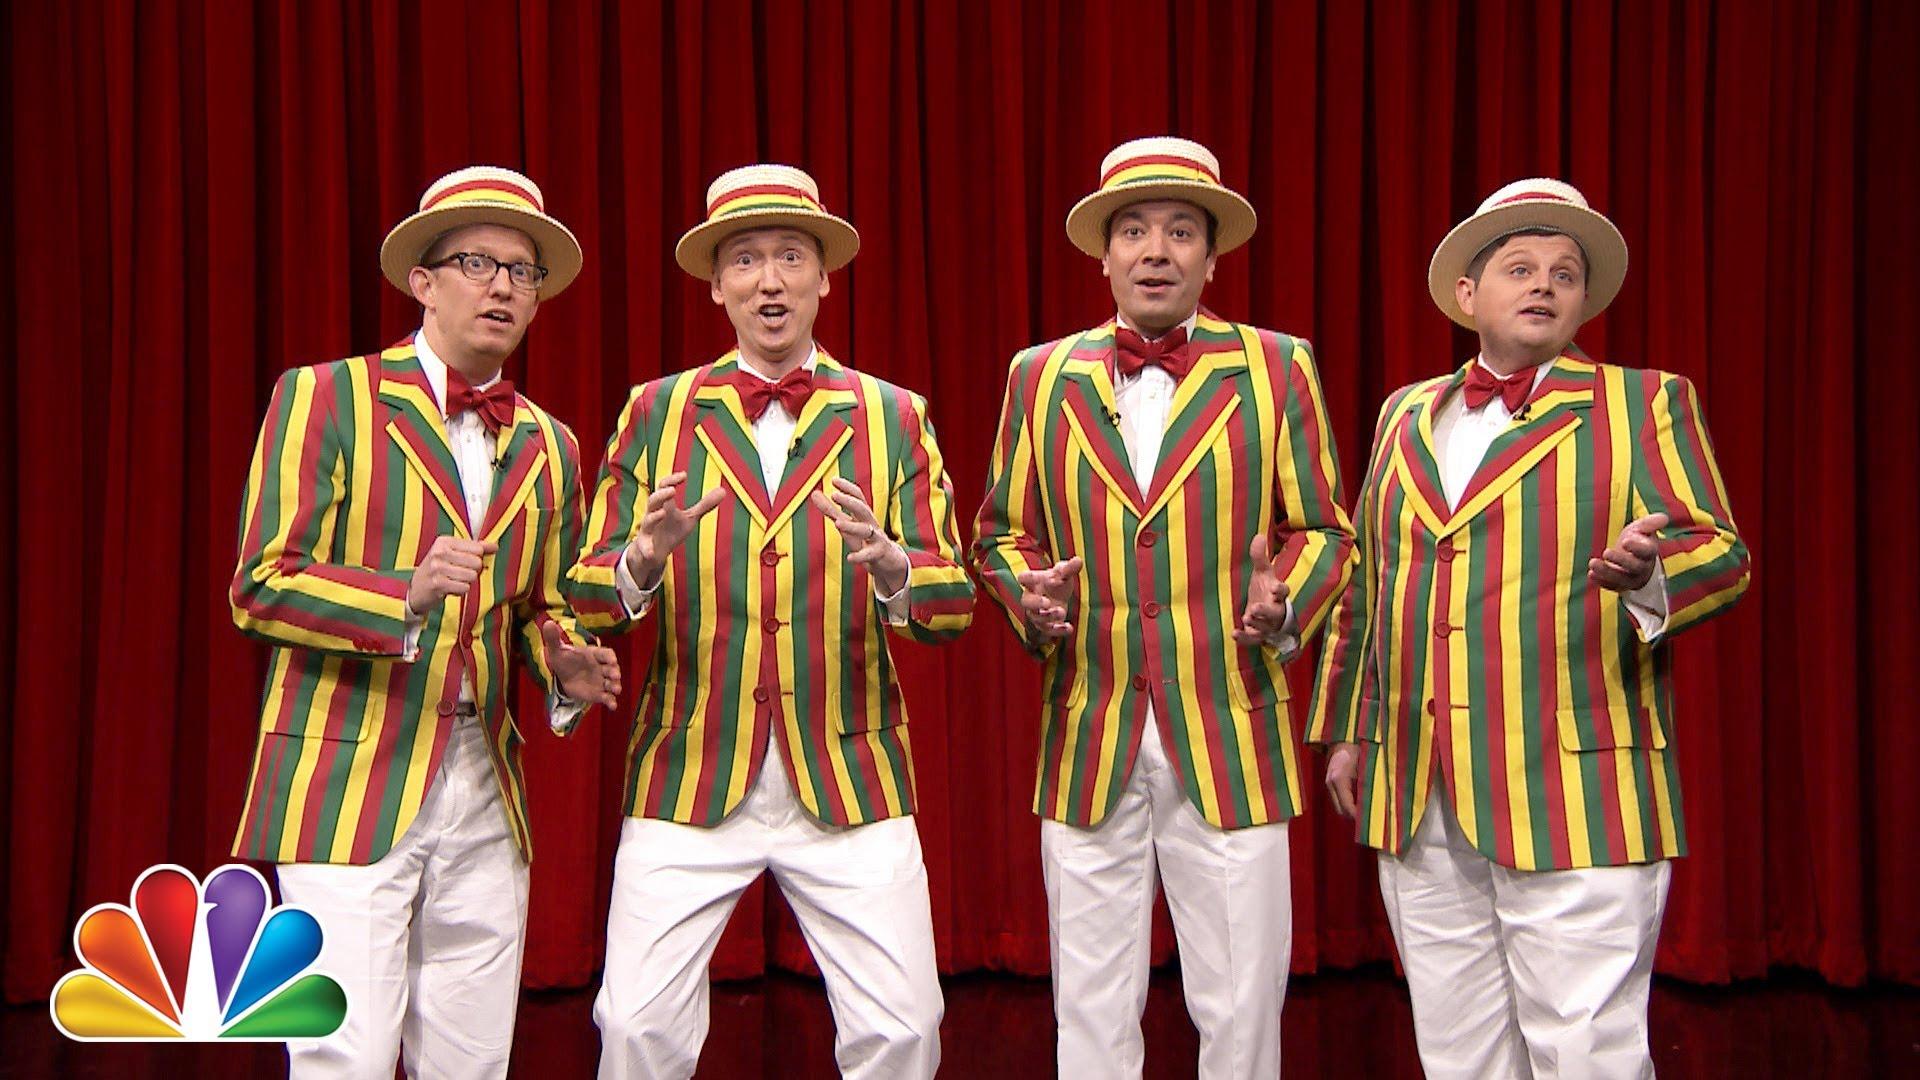 Barbershop Quartet : Jimmy Fallon?s Barbershop Quartet Covers R. Kelly?s ?Ignition ...